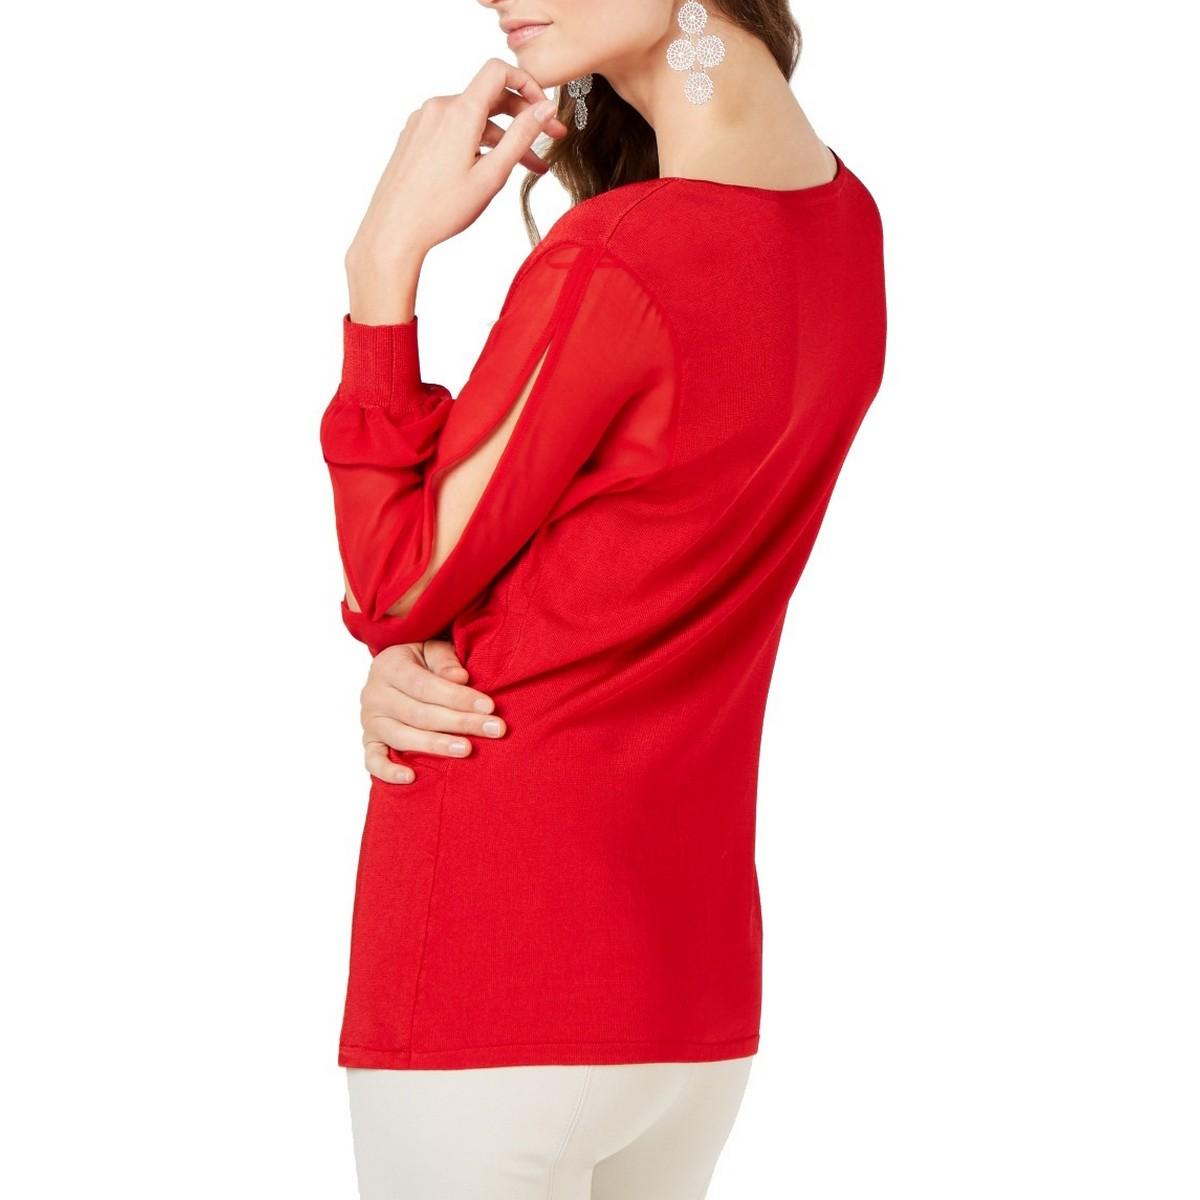 INC-NEW-Women-039-s-Surplice-Illusion-sleeve-Knit-Blouse-Shirt-Top-TEDO thumbnail 9